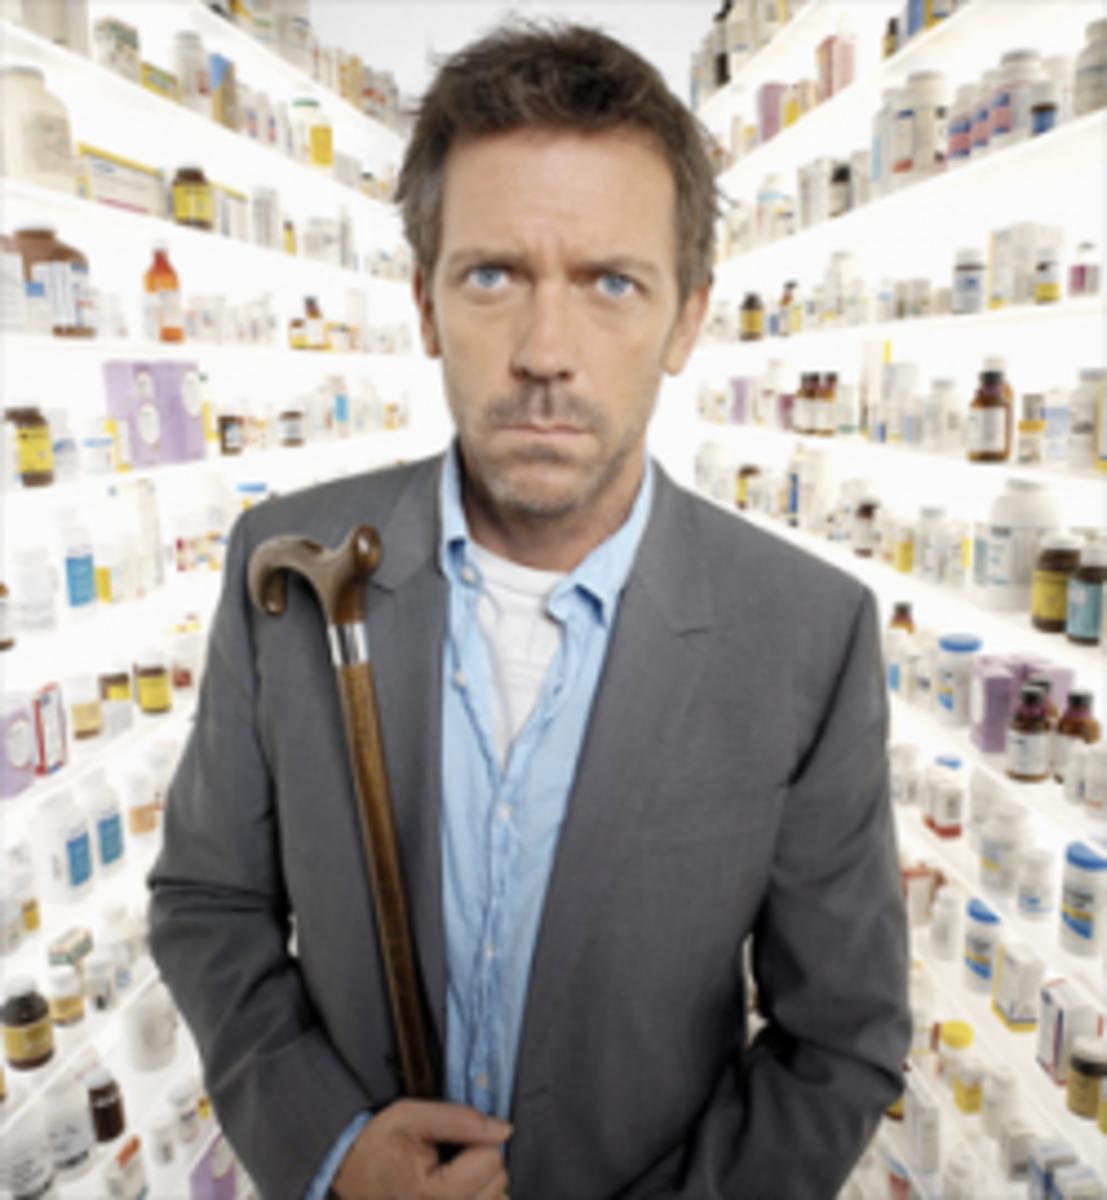 House (Hugh Laurie) Atheist